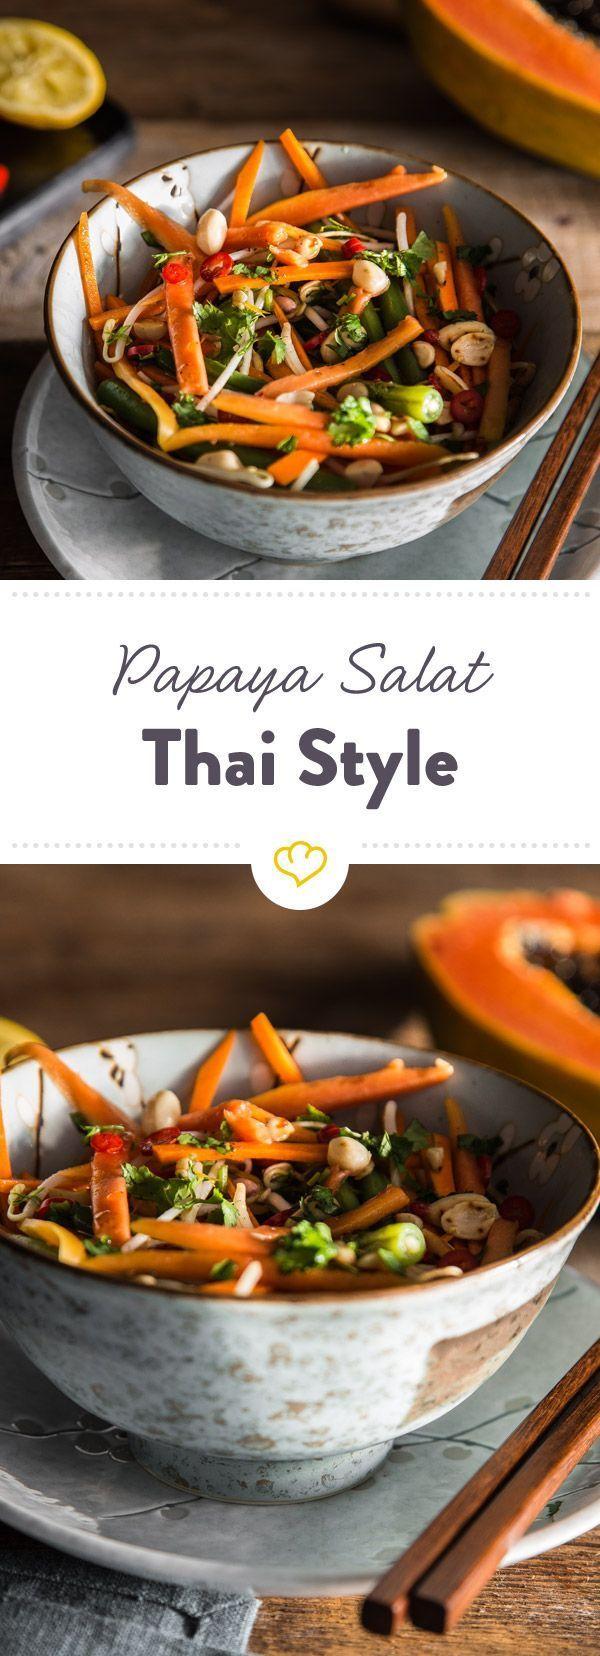 Thai papaya salad with peanuts and chili dressing  - Low Carb -